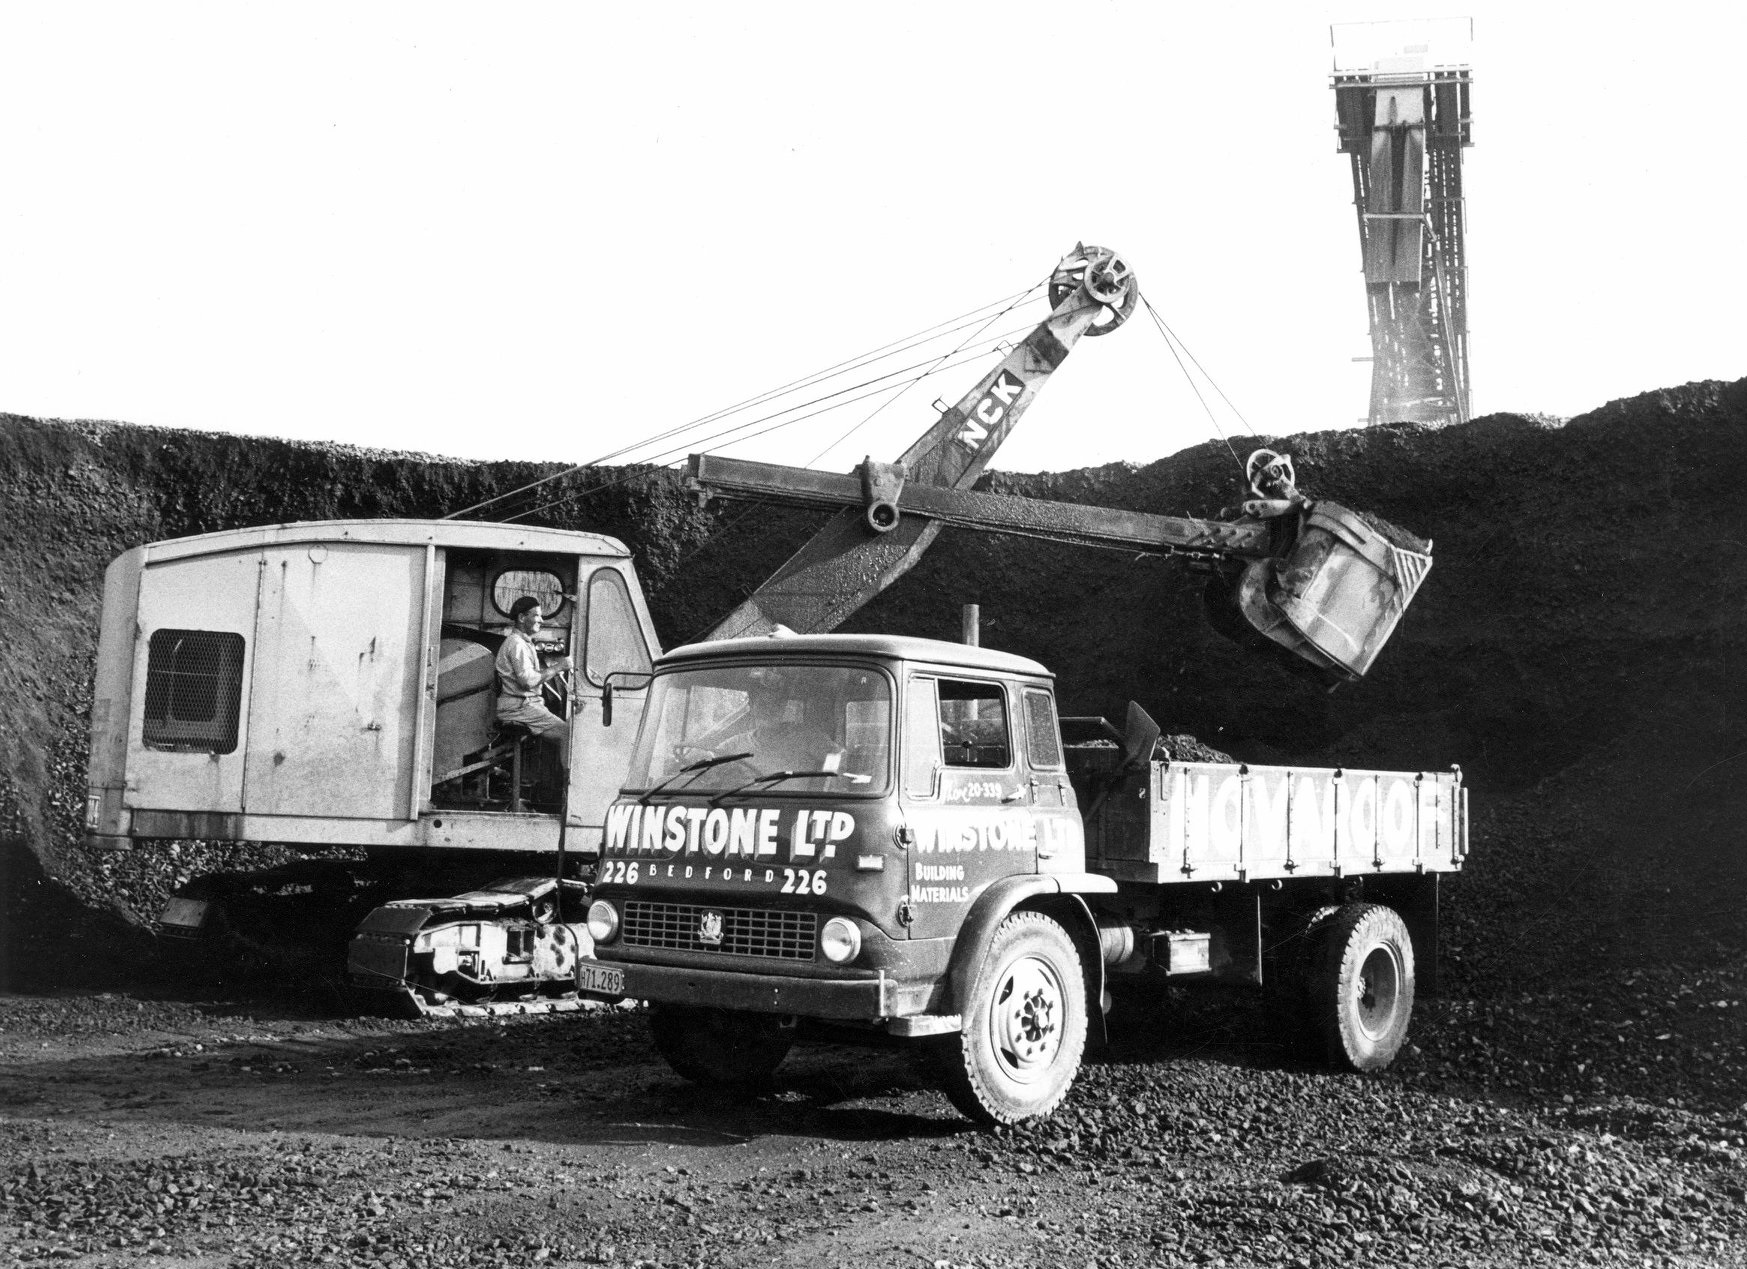 Winstone-NCK-304-shovel